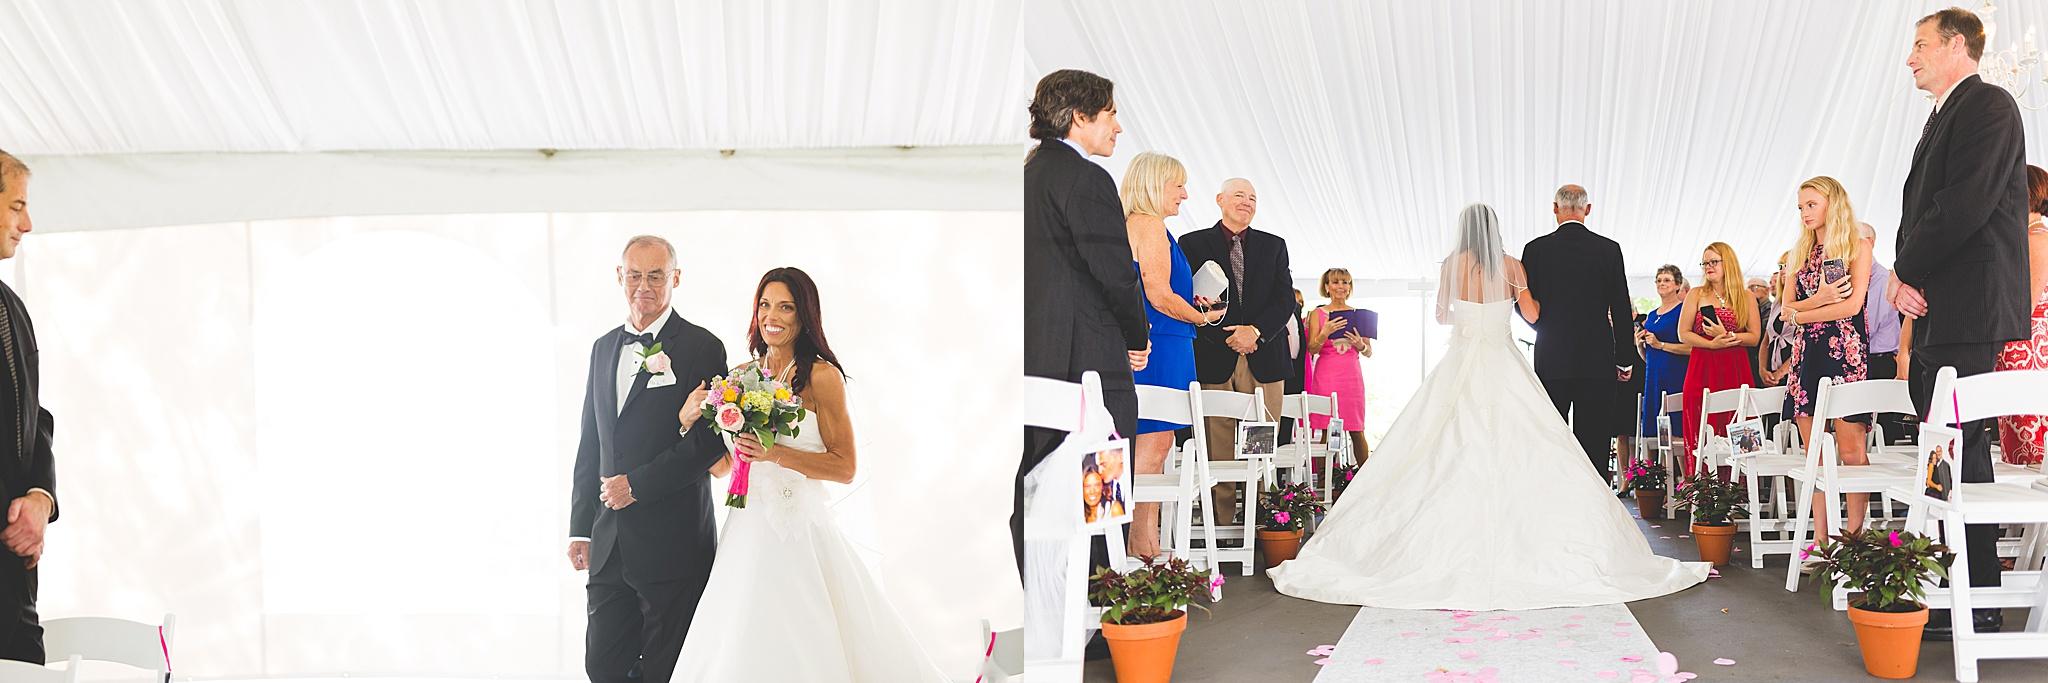 Albany_Wedding_Photographer_7626.jpg